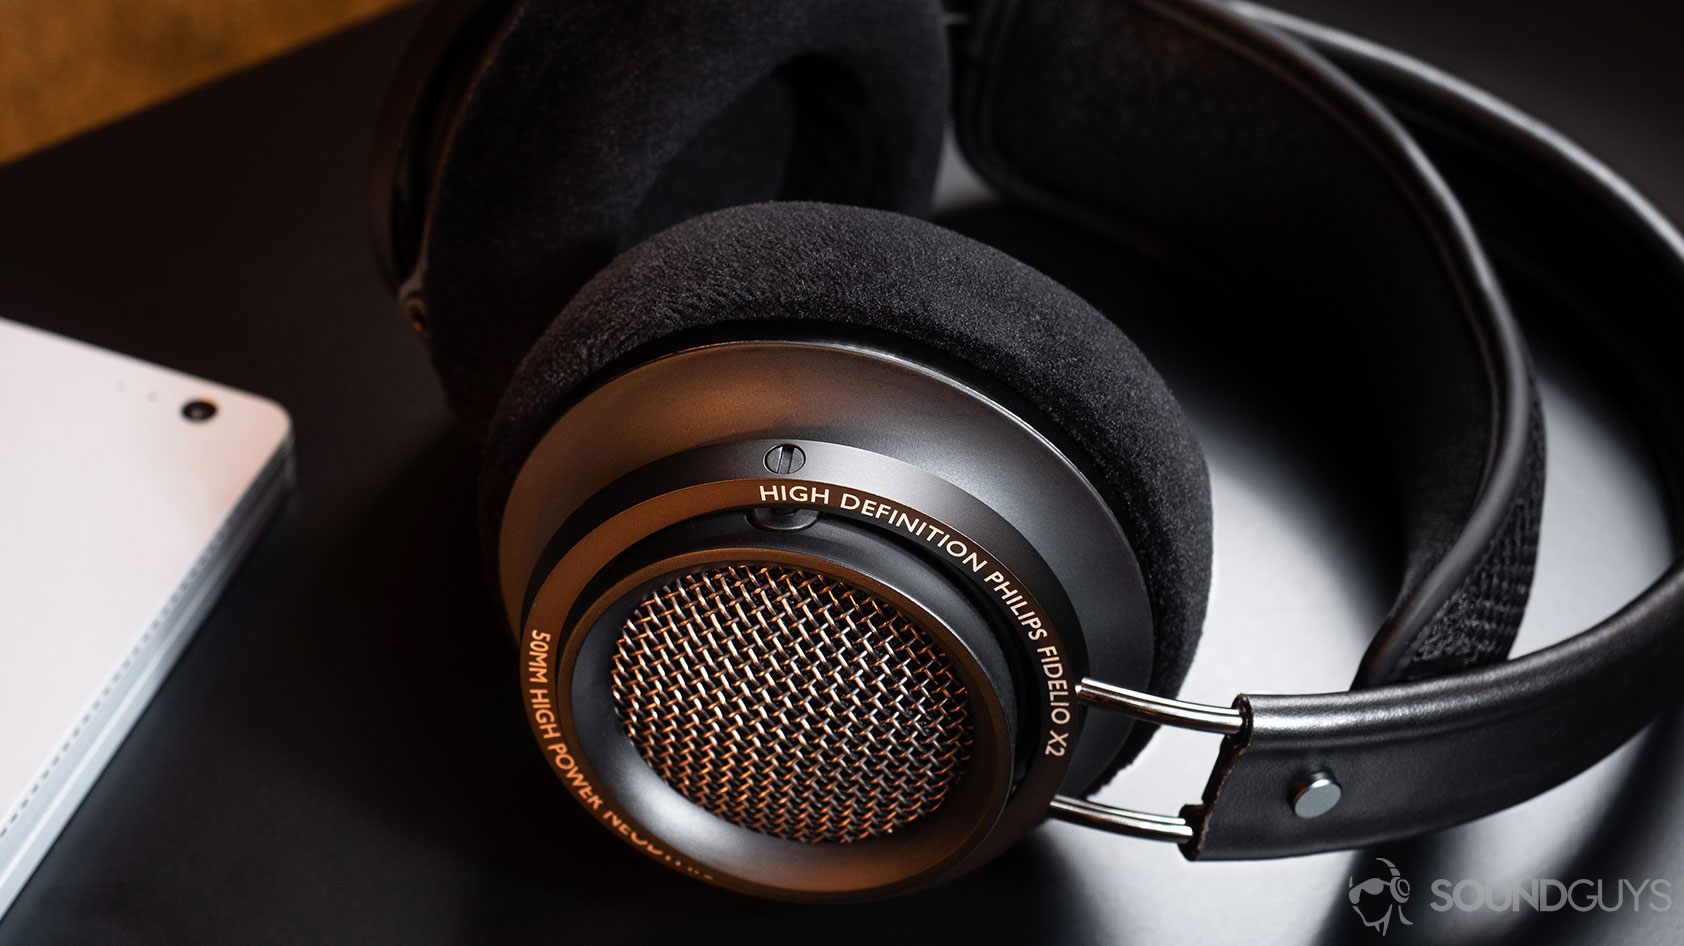 Best Aptx Bluetooth Headphones Of 2020 Soundguys